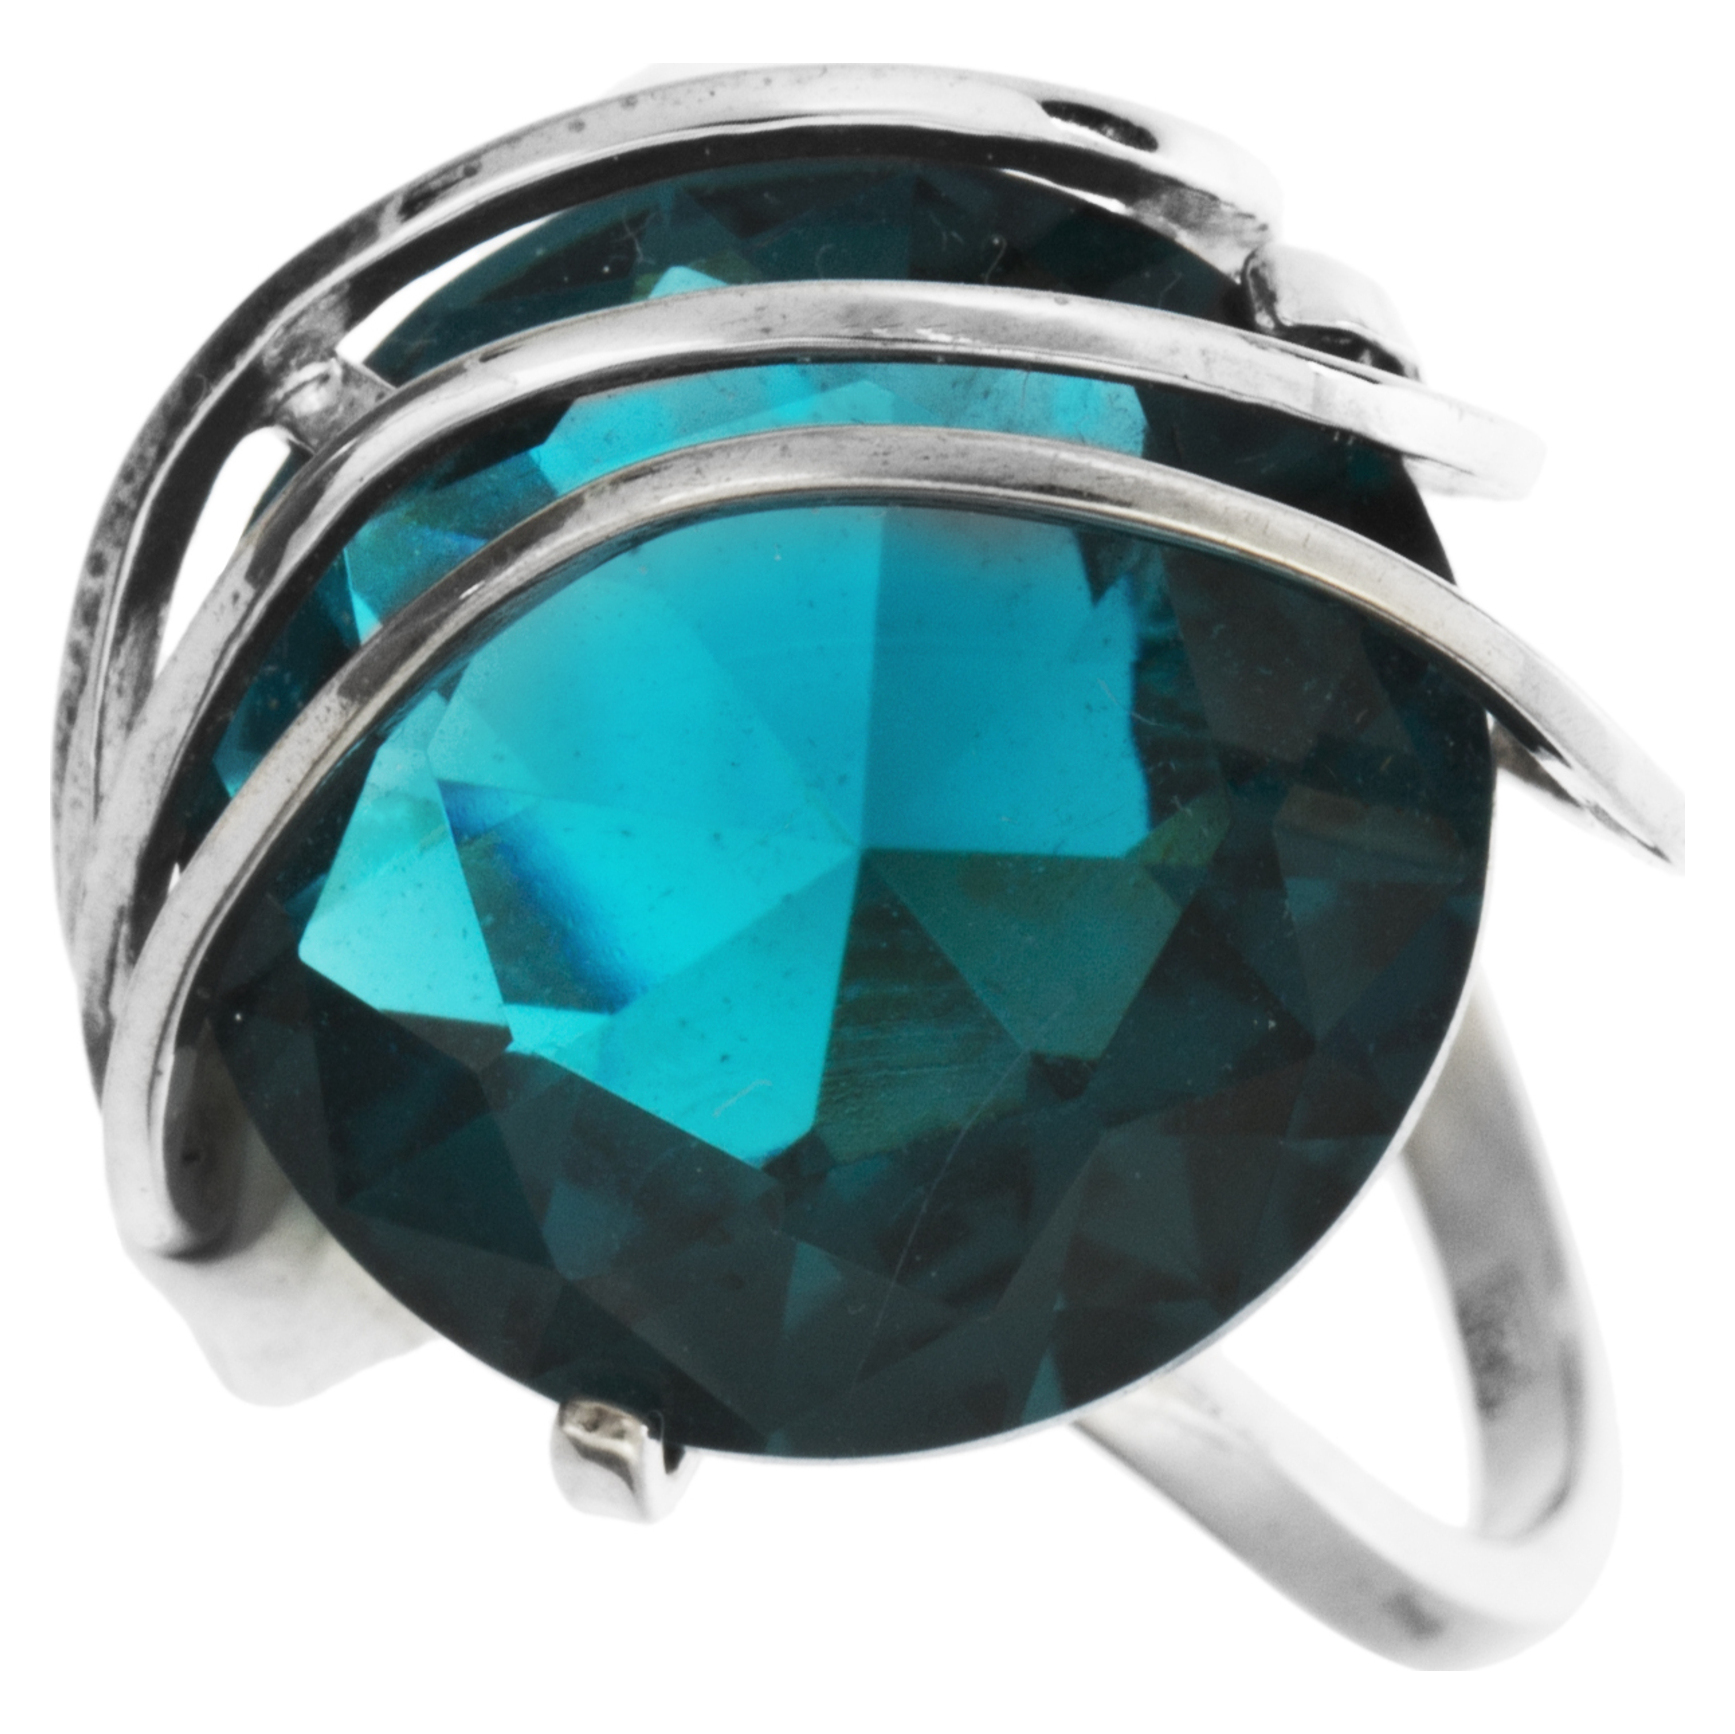 Серебряное кольцо Кварц арт. 4к-80136-04 4к-80136-04